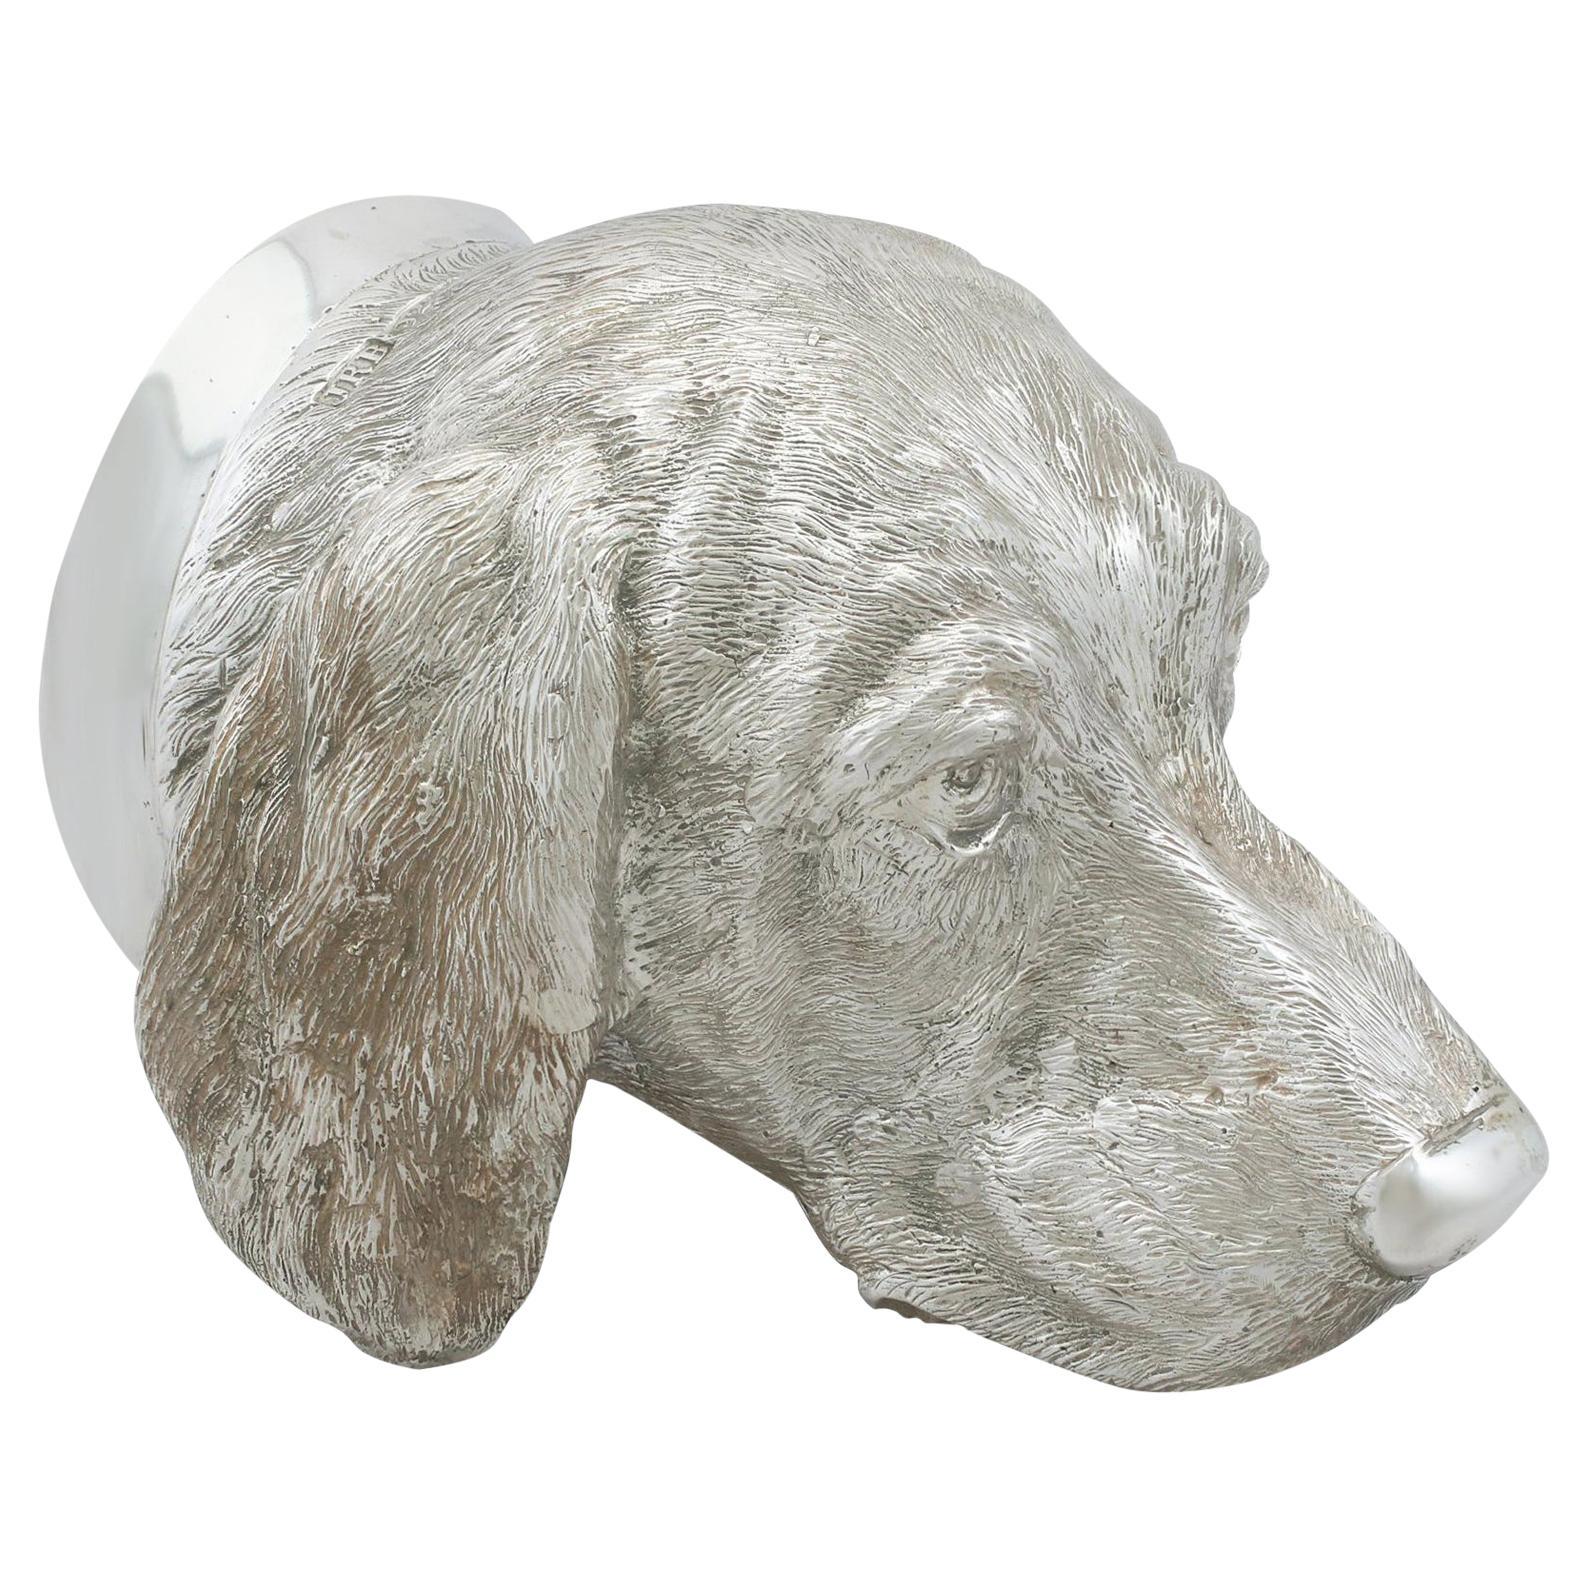 Sterling Silver 'Dog' Stirrup Cup